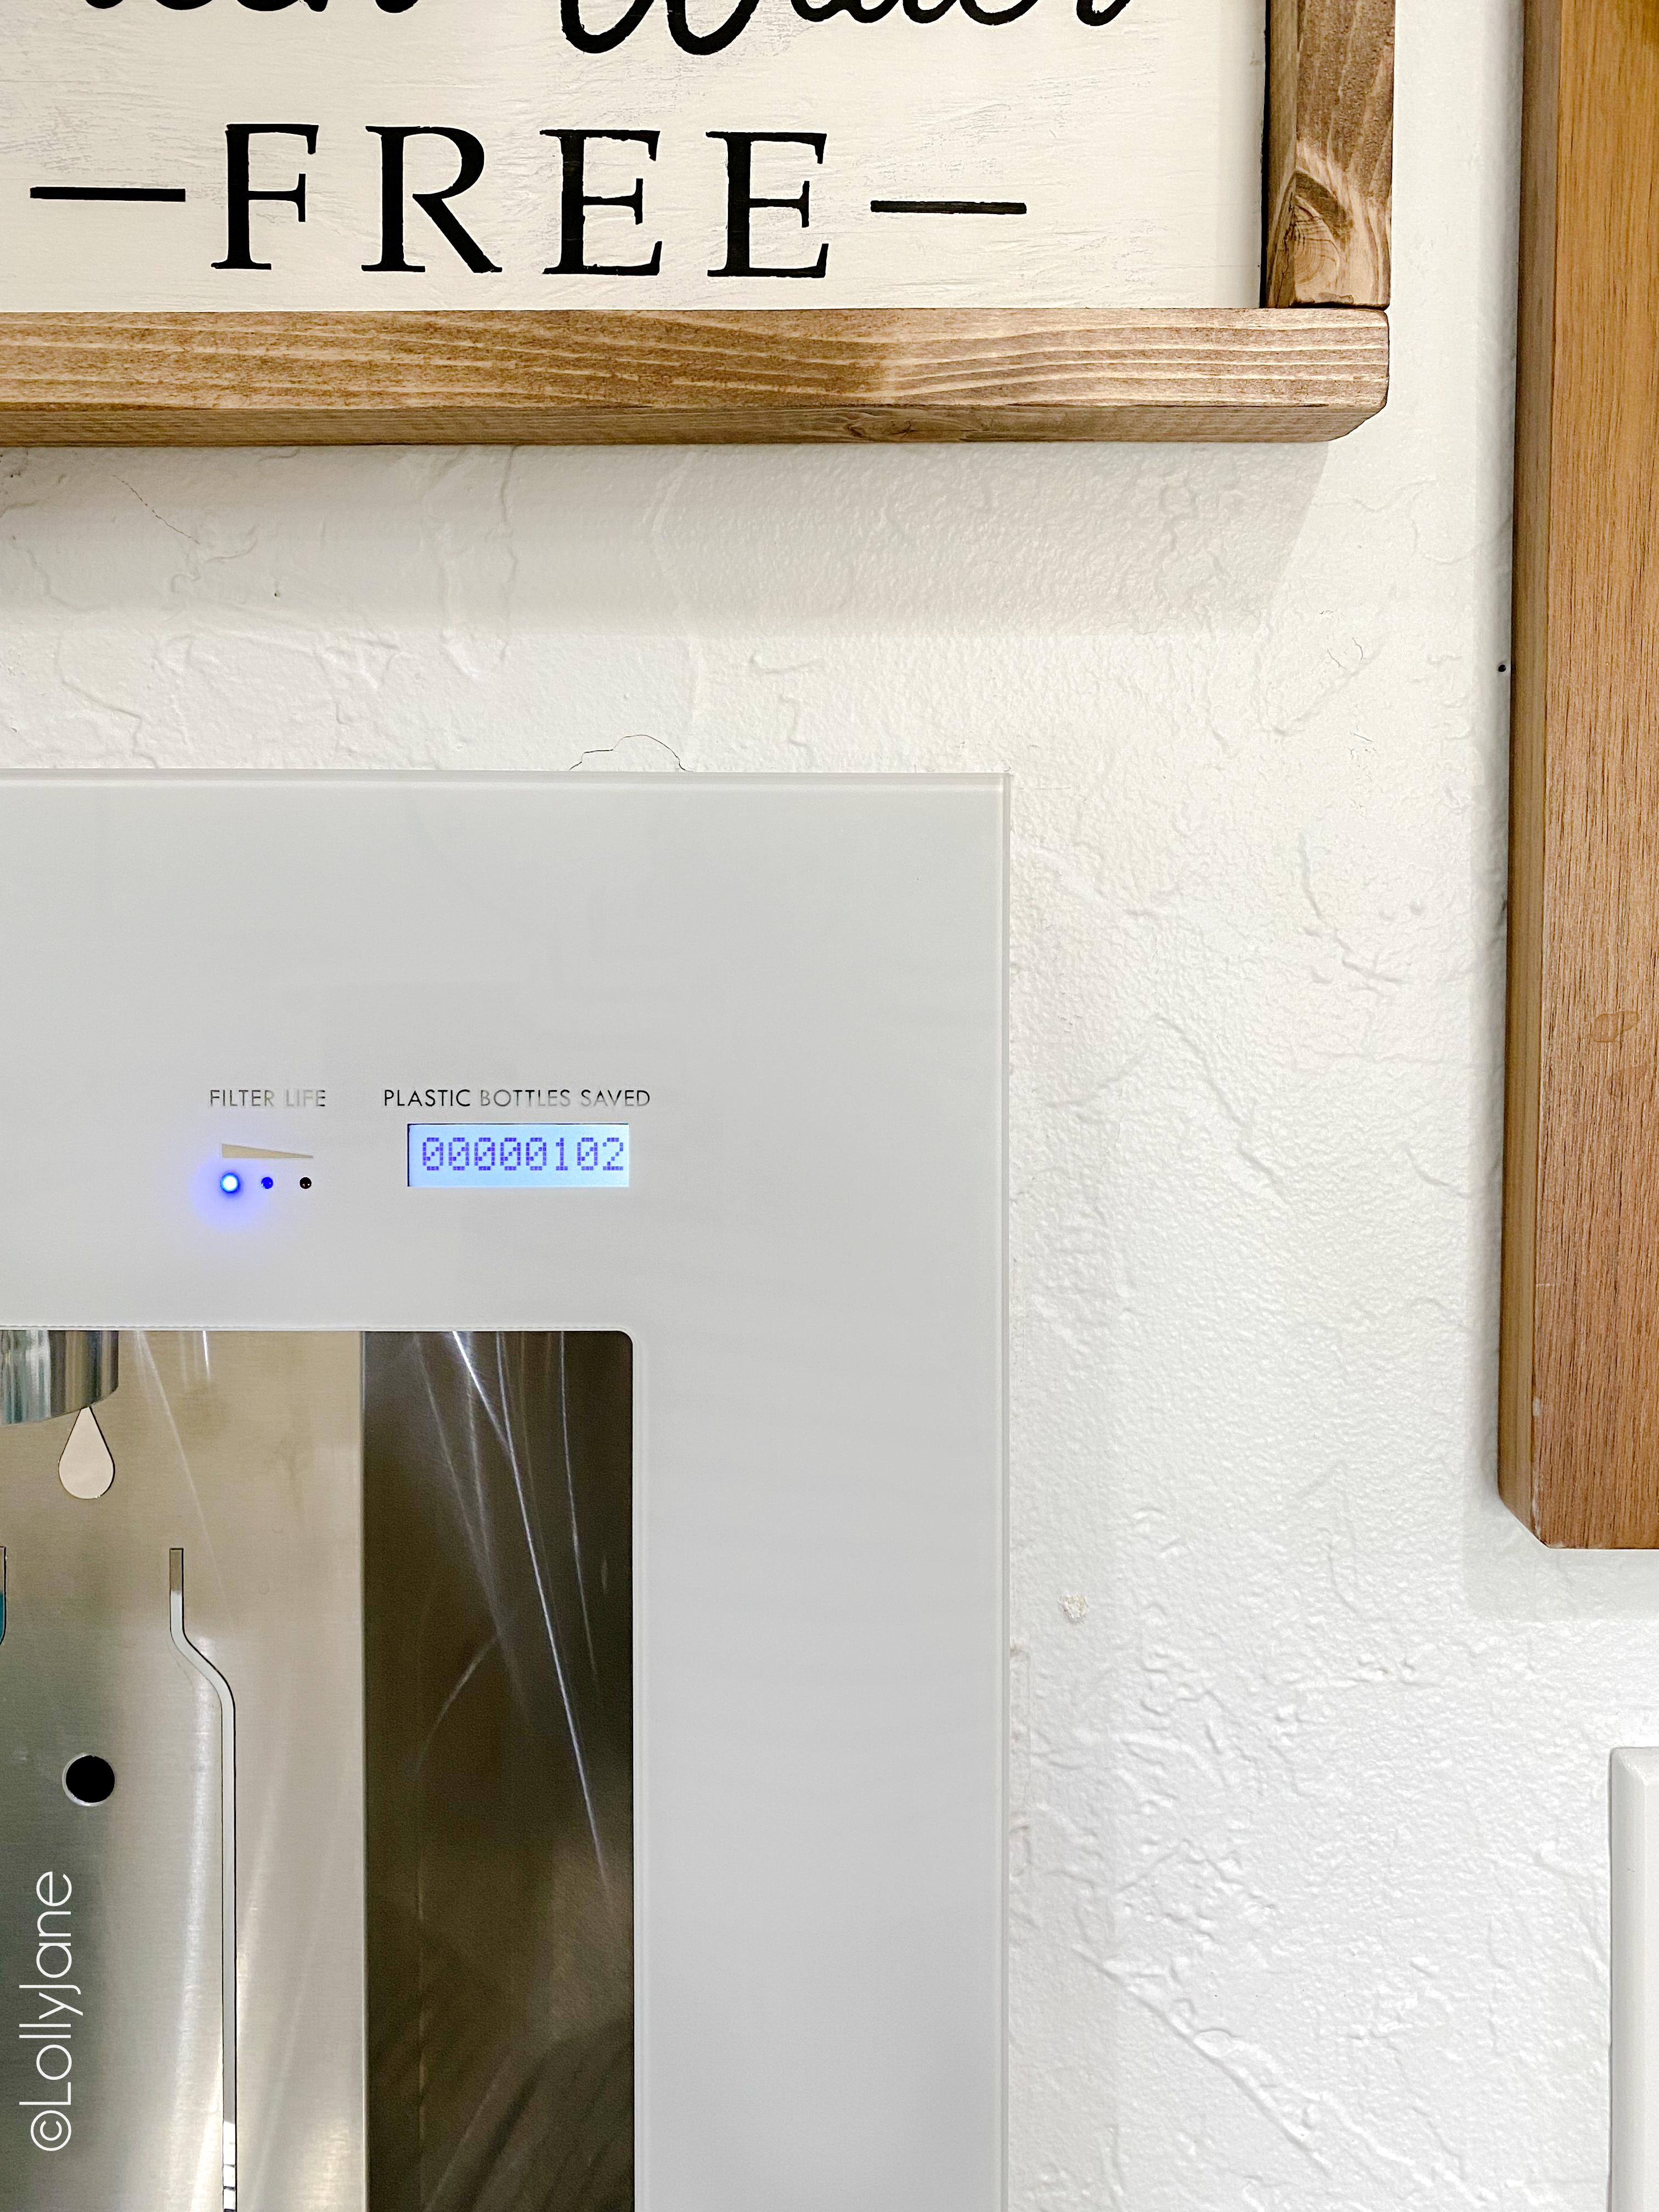 Have a hard time drinking water? 💦 Try Elkay's water dispenser... game changer! #waterdispenser #elkay #gogreen